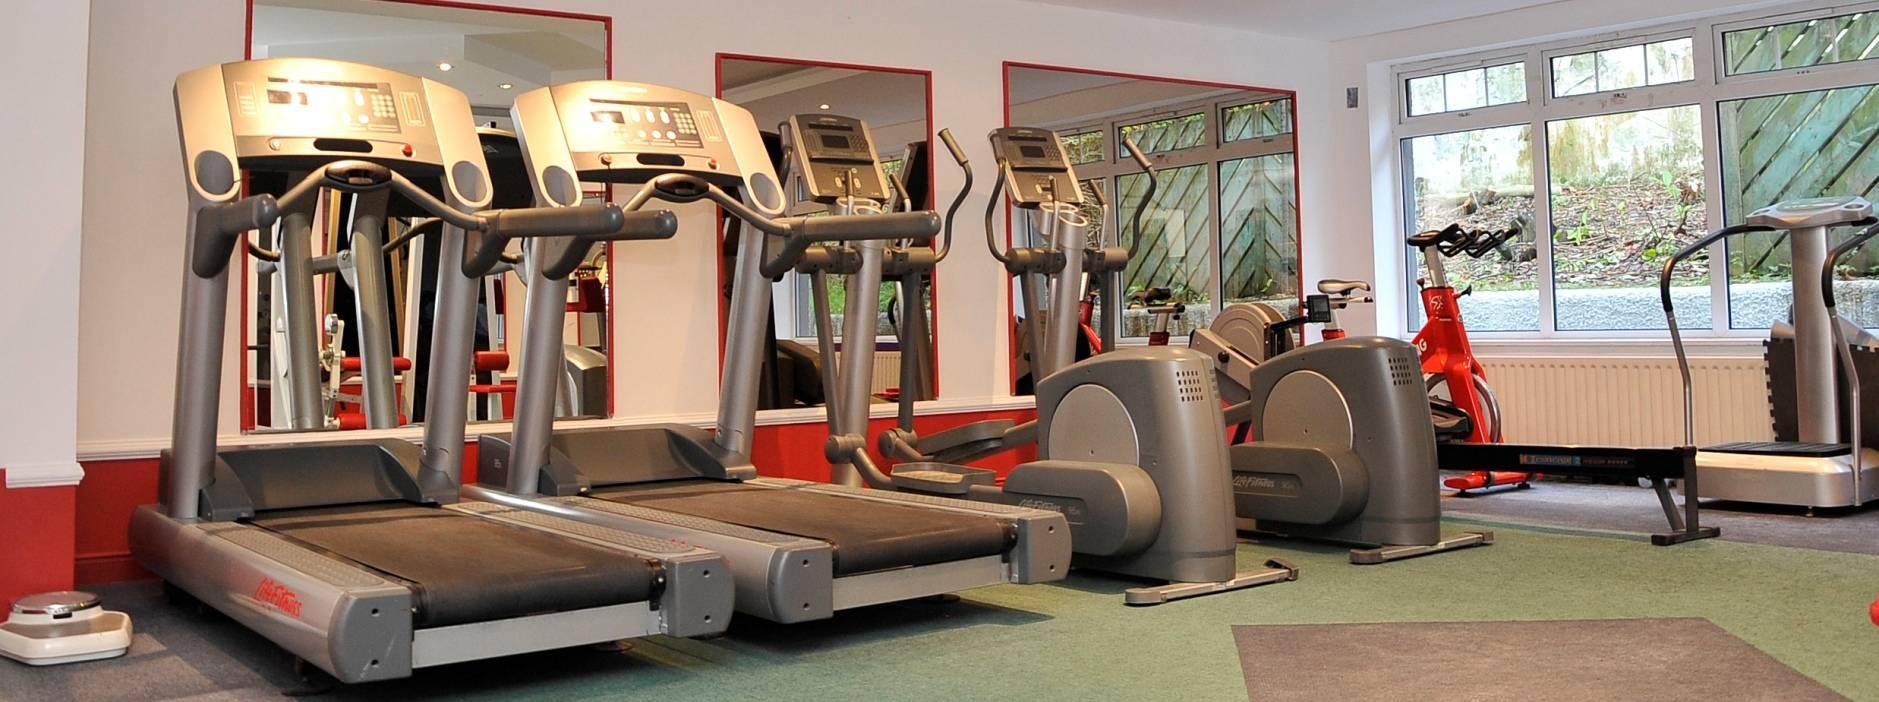 Gym Fitness Bushtown Hotel Coleraine